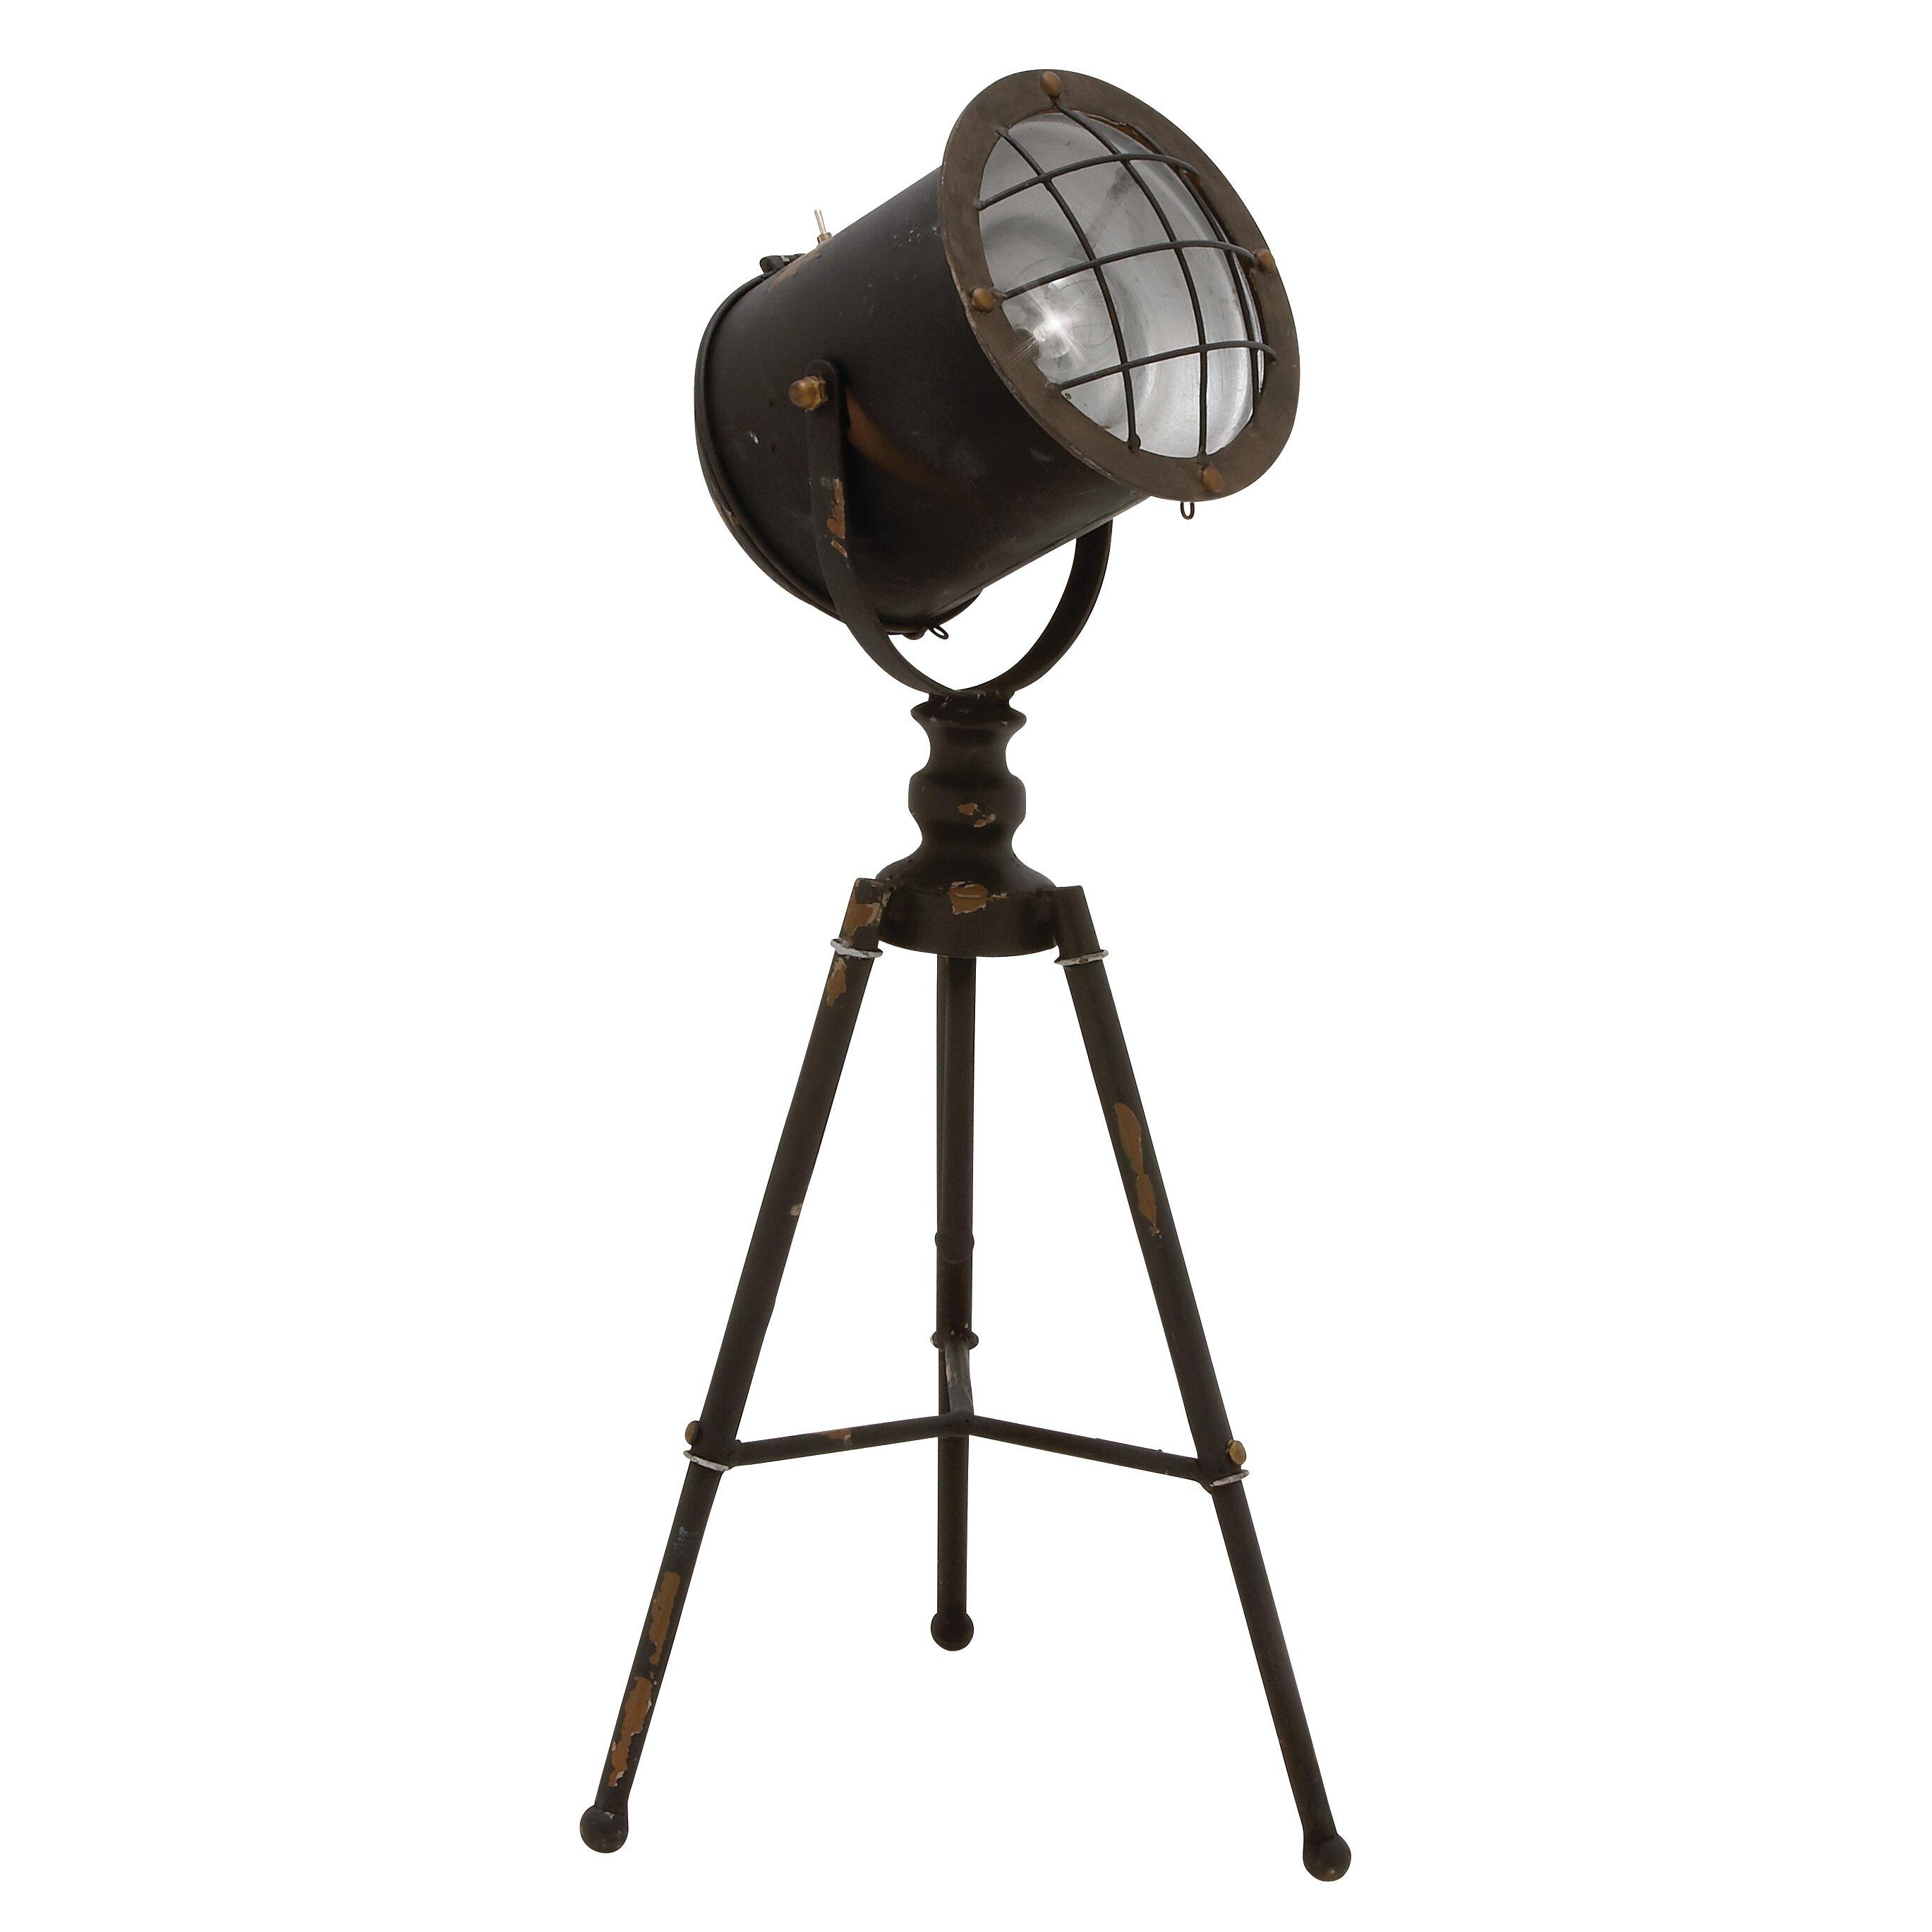 Cole grey tripod spot light 24 table lamp reviews wayfair - Tripod spotlight table lamp ...